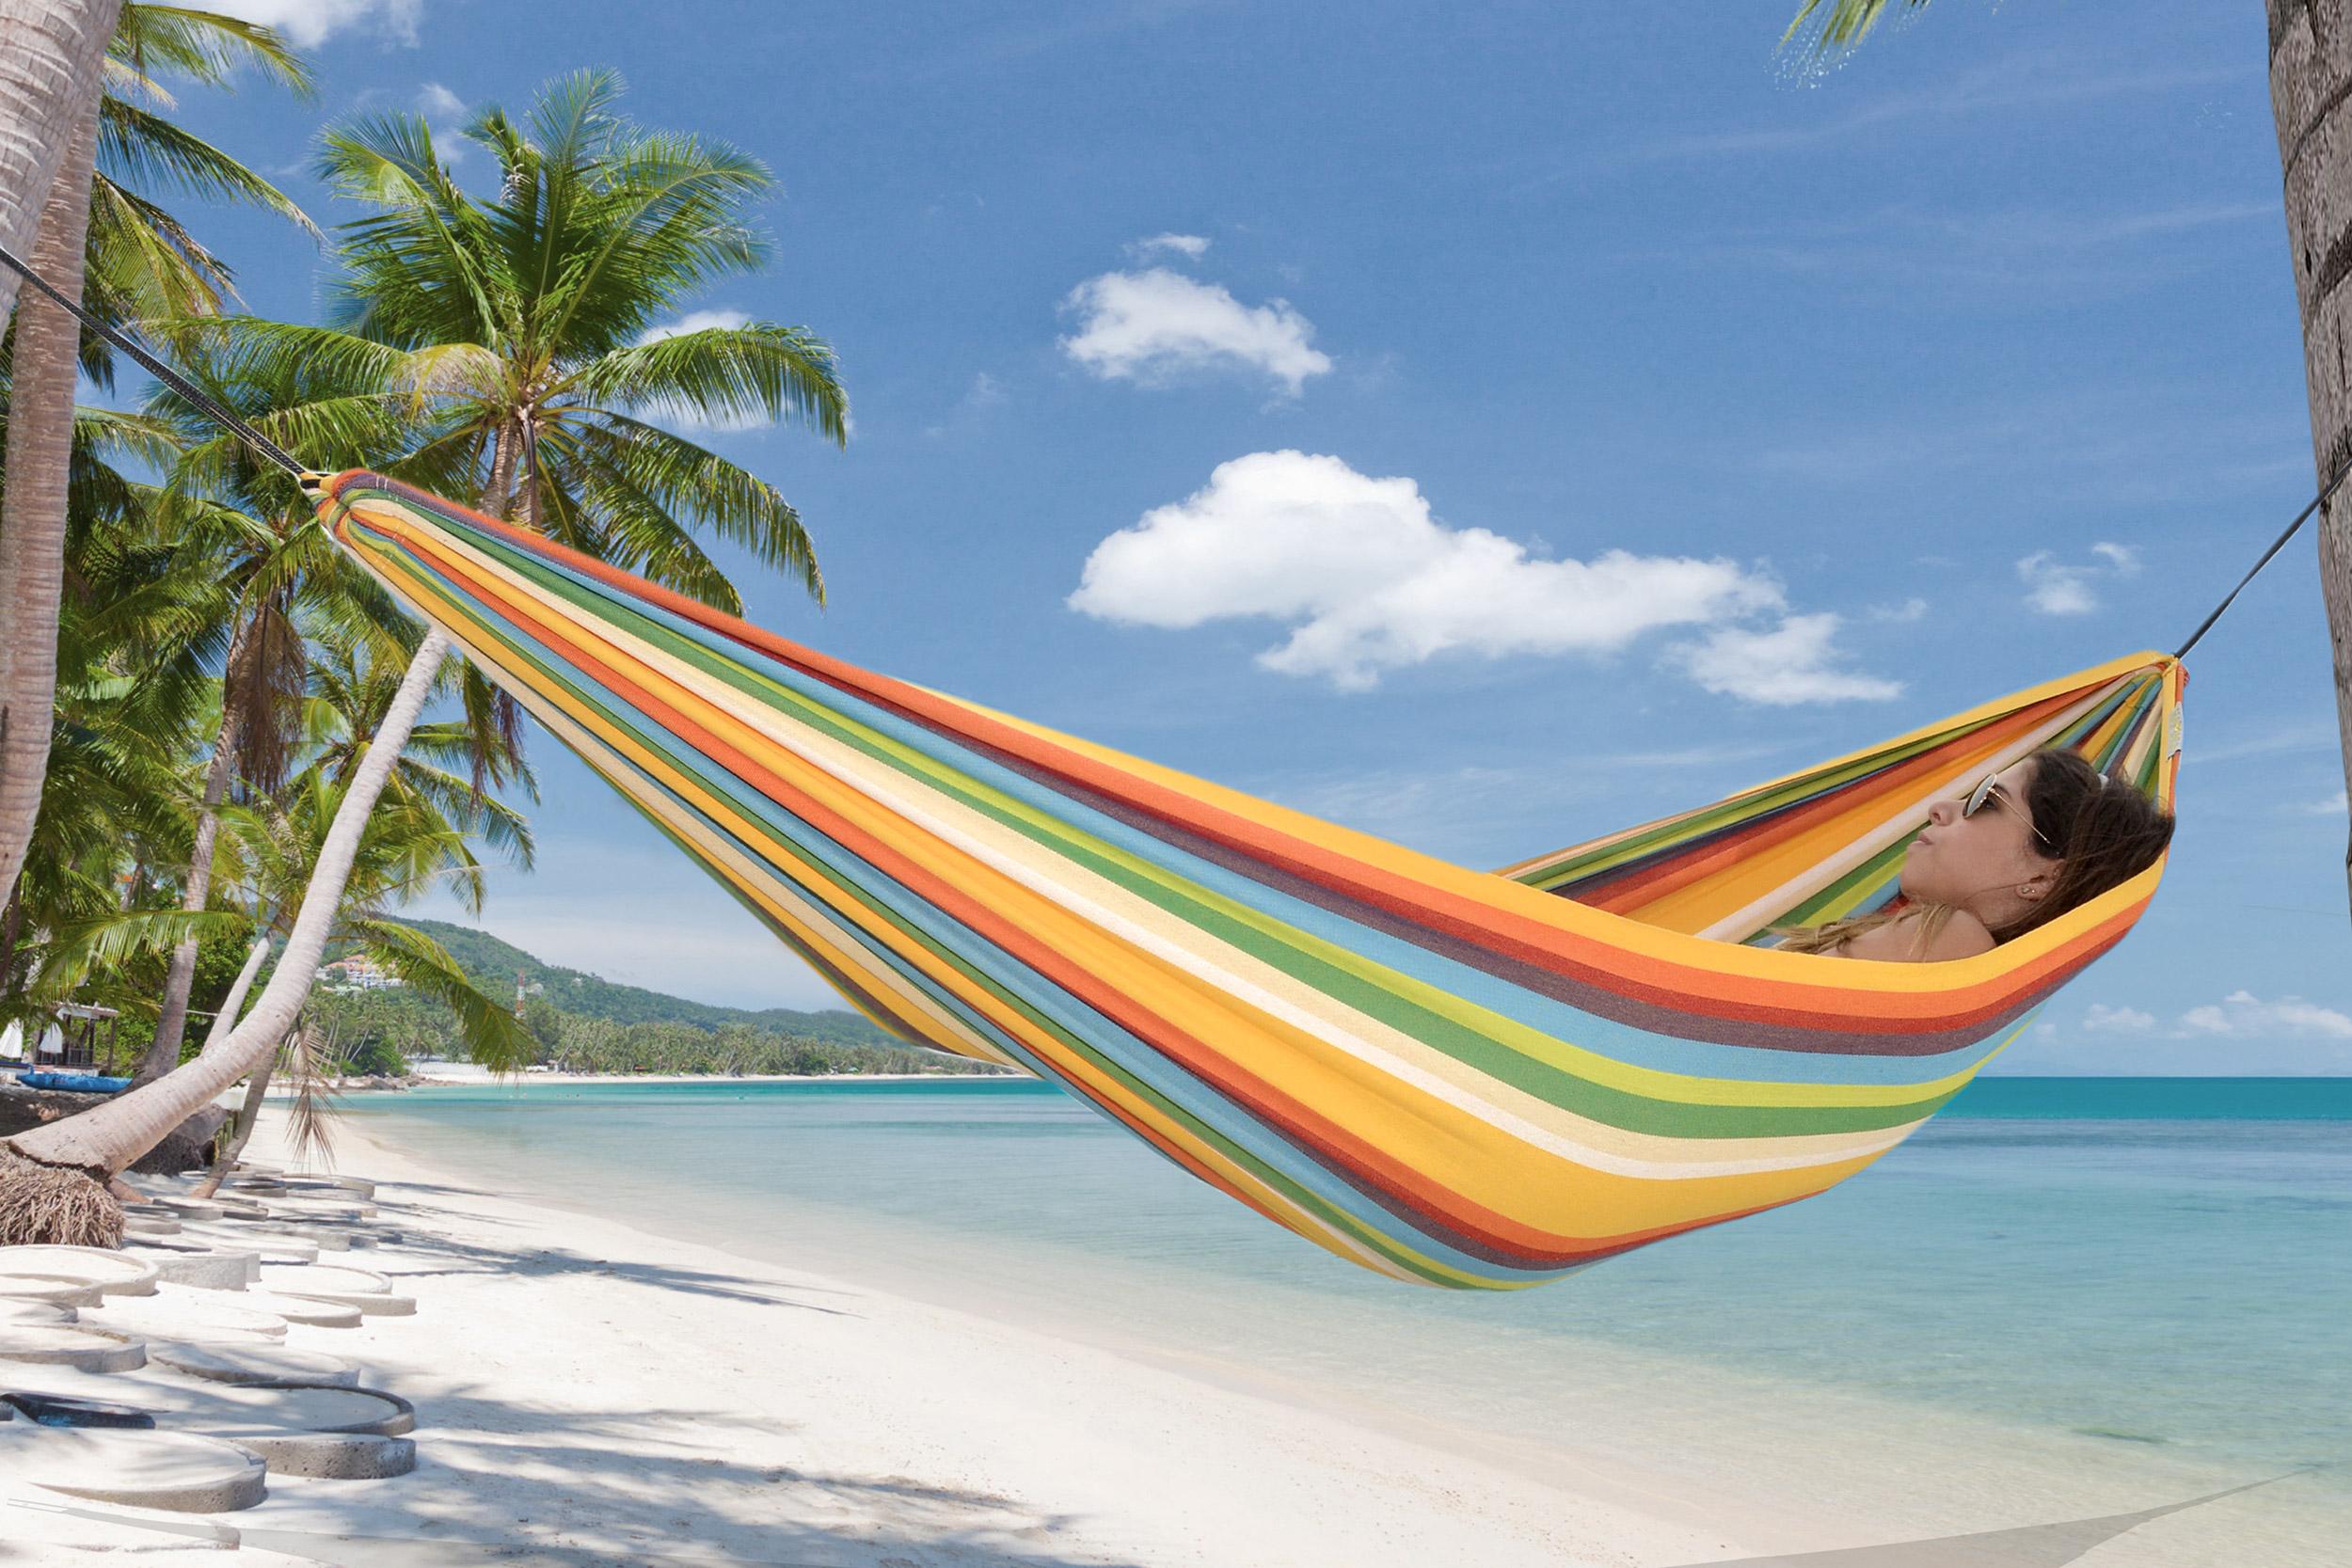 Hamaca playa 28 images hamaca playa barn h 228 ngmatta - Hamacas de playa ...